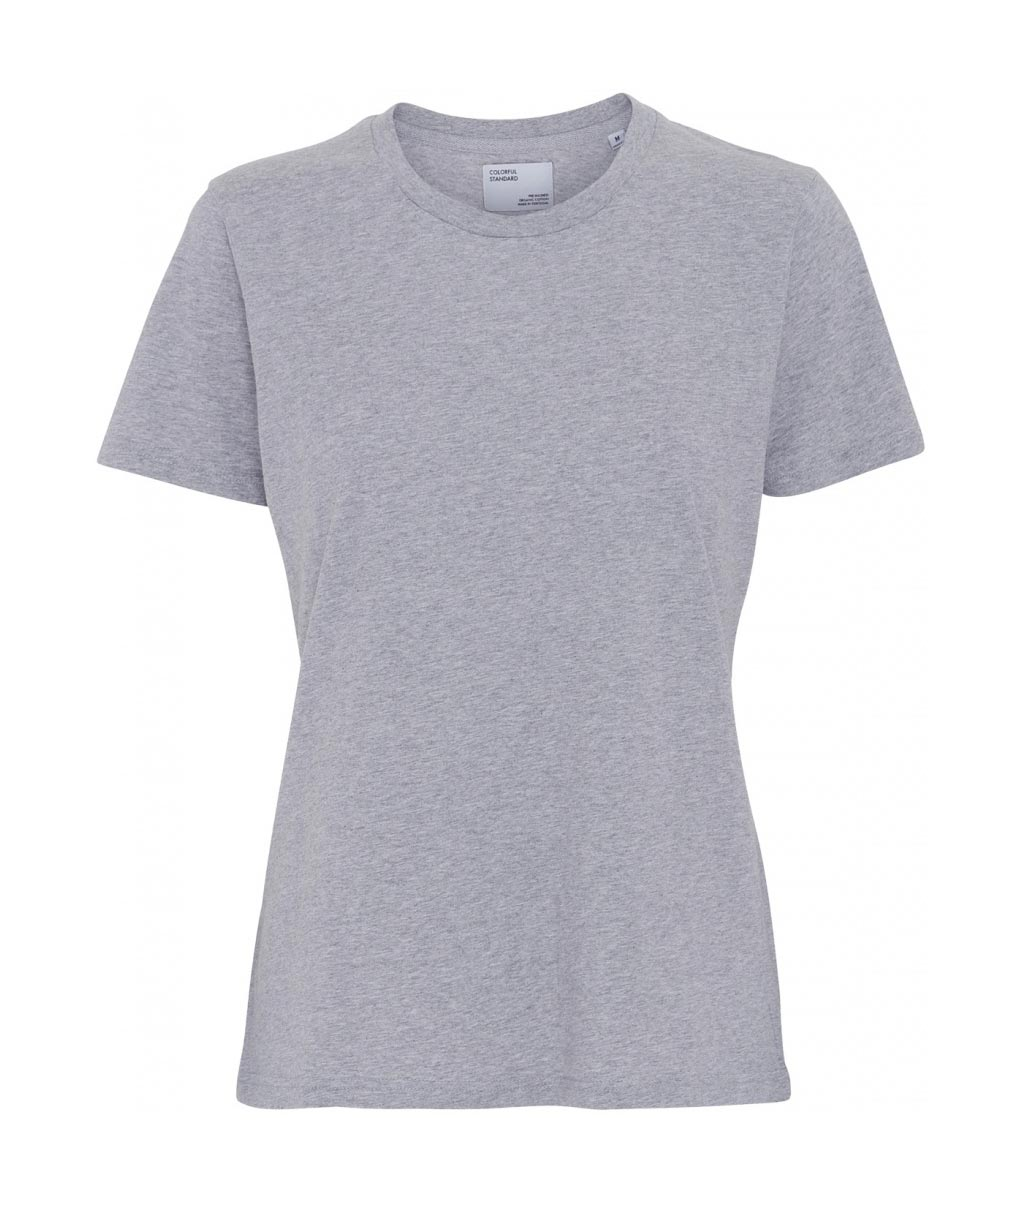 Colorful Standard COLORFUL STANDARD women's light organic cotton tee shirt round neck heather grey